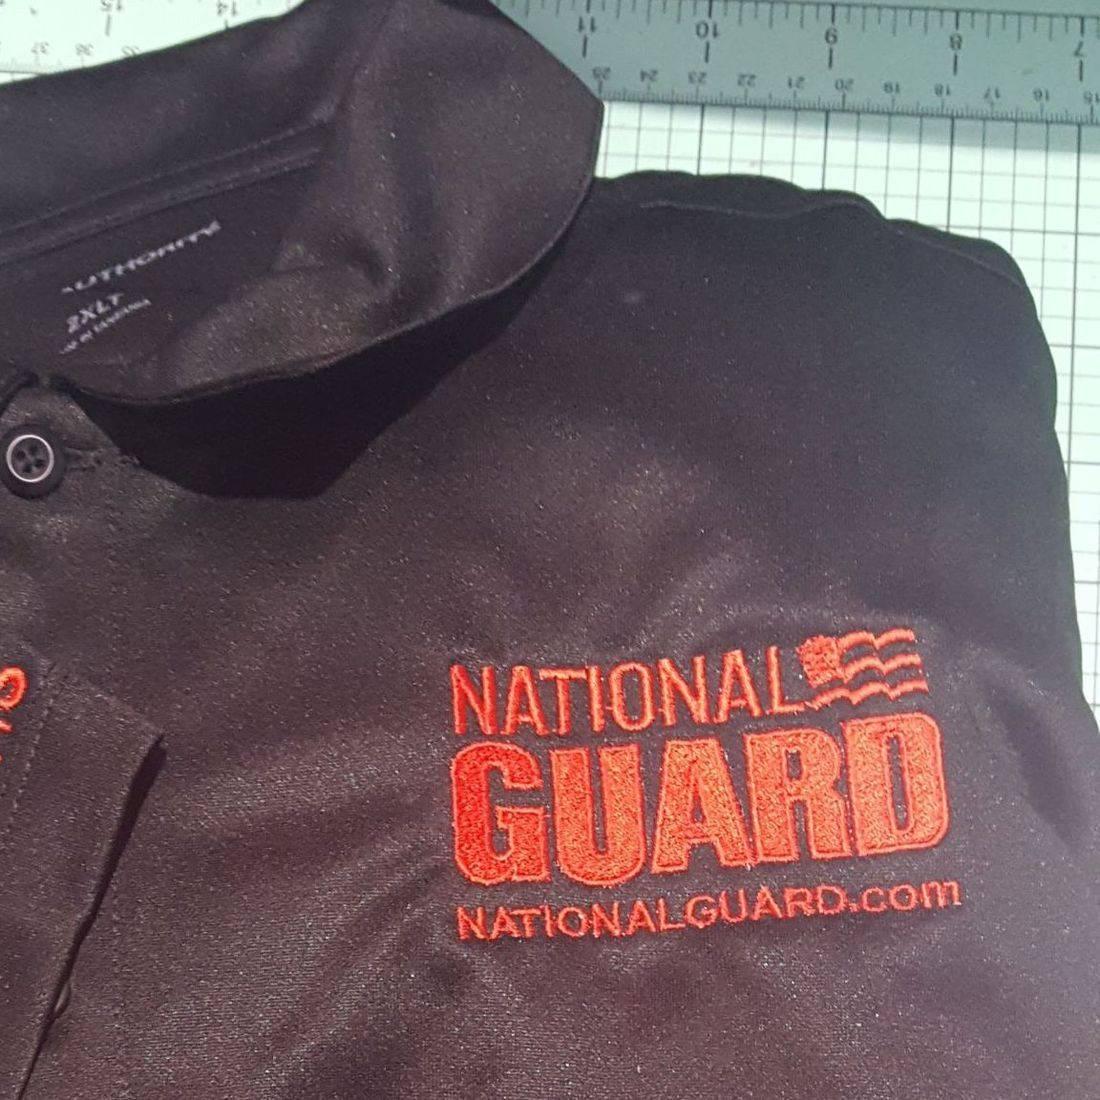 National Guard Embroidered Emblem